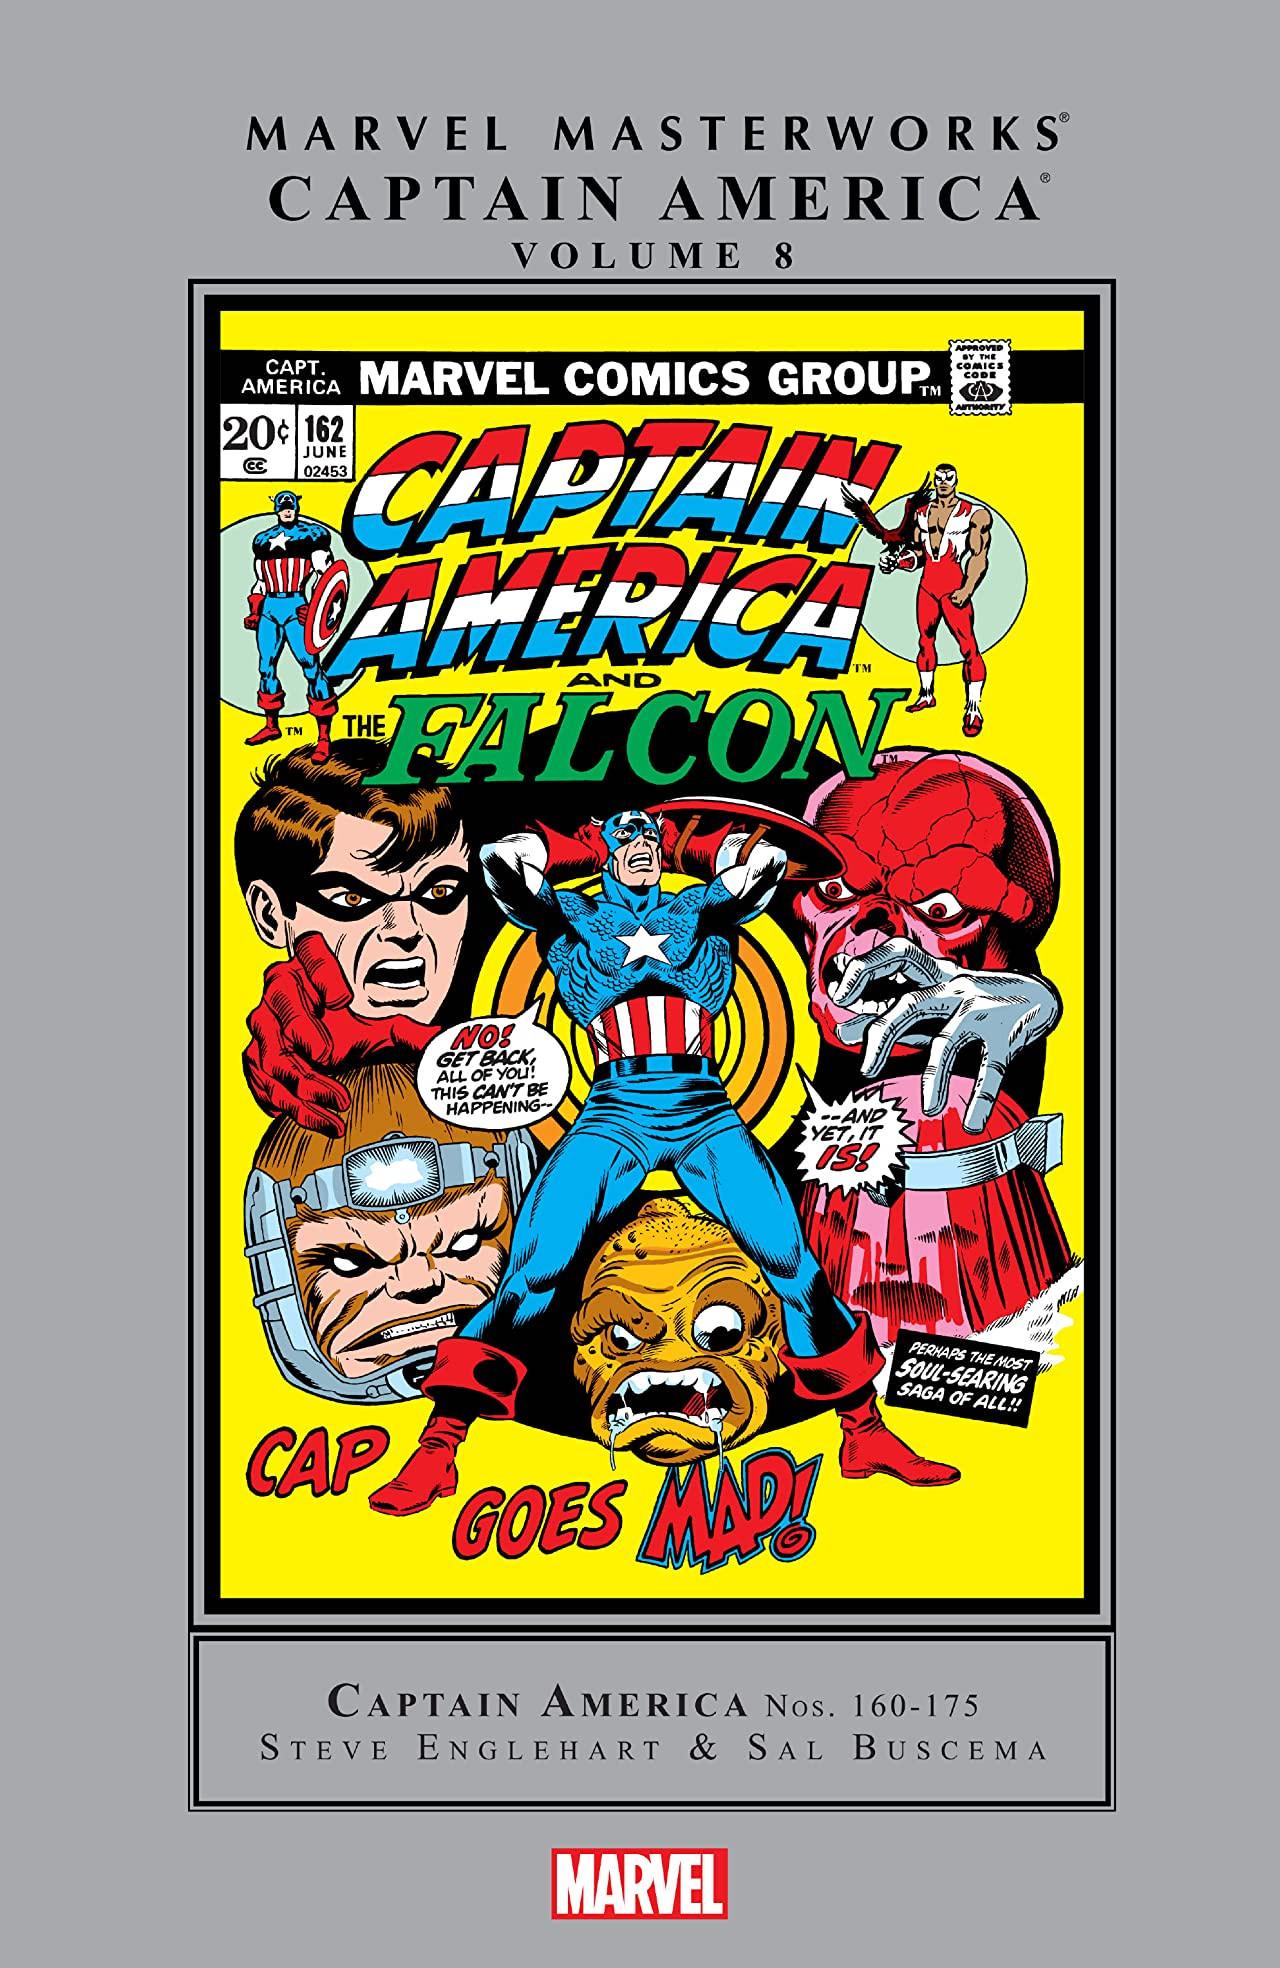 Marvel Masterworks: Captain America Vol 1 8